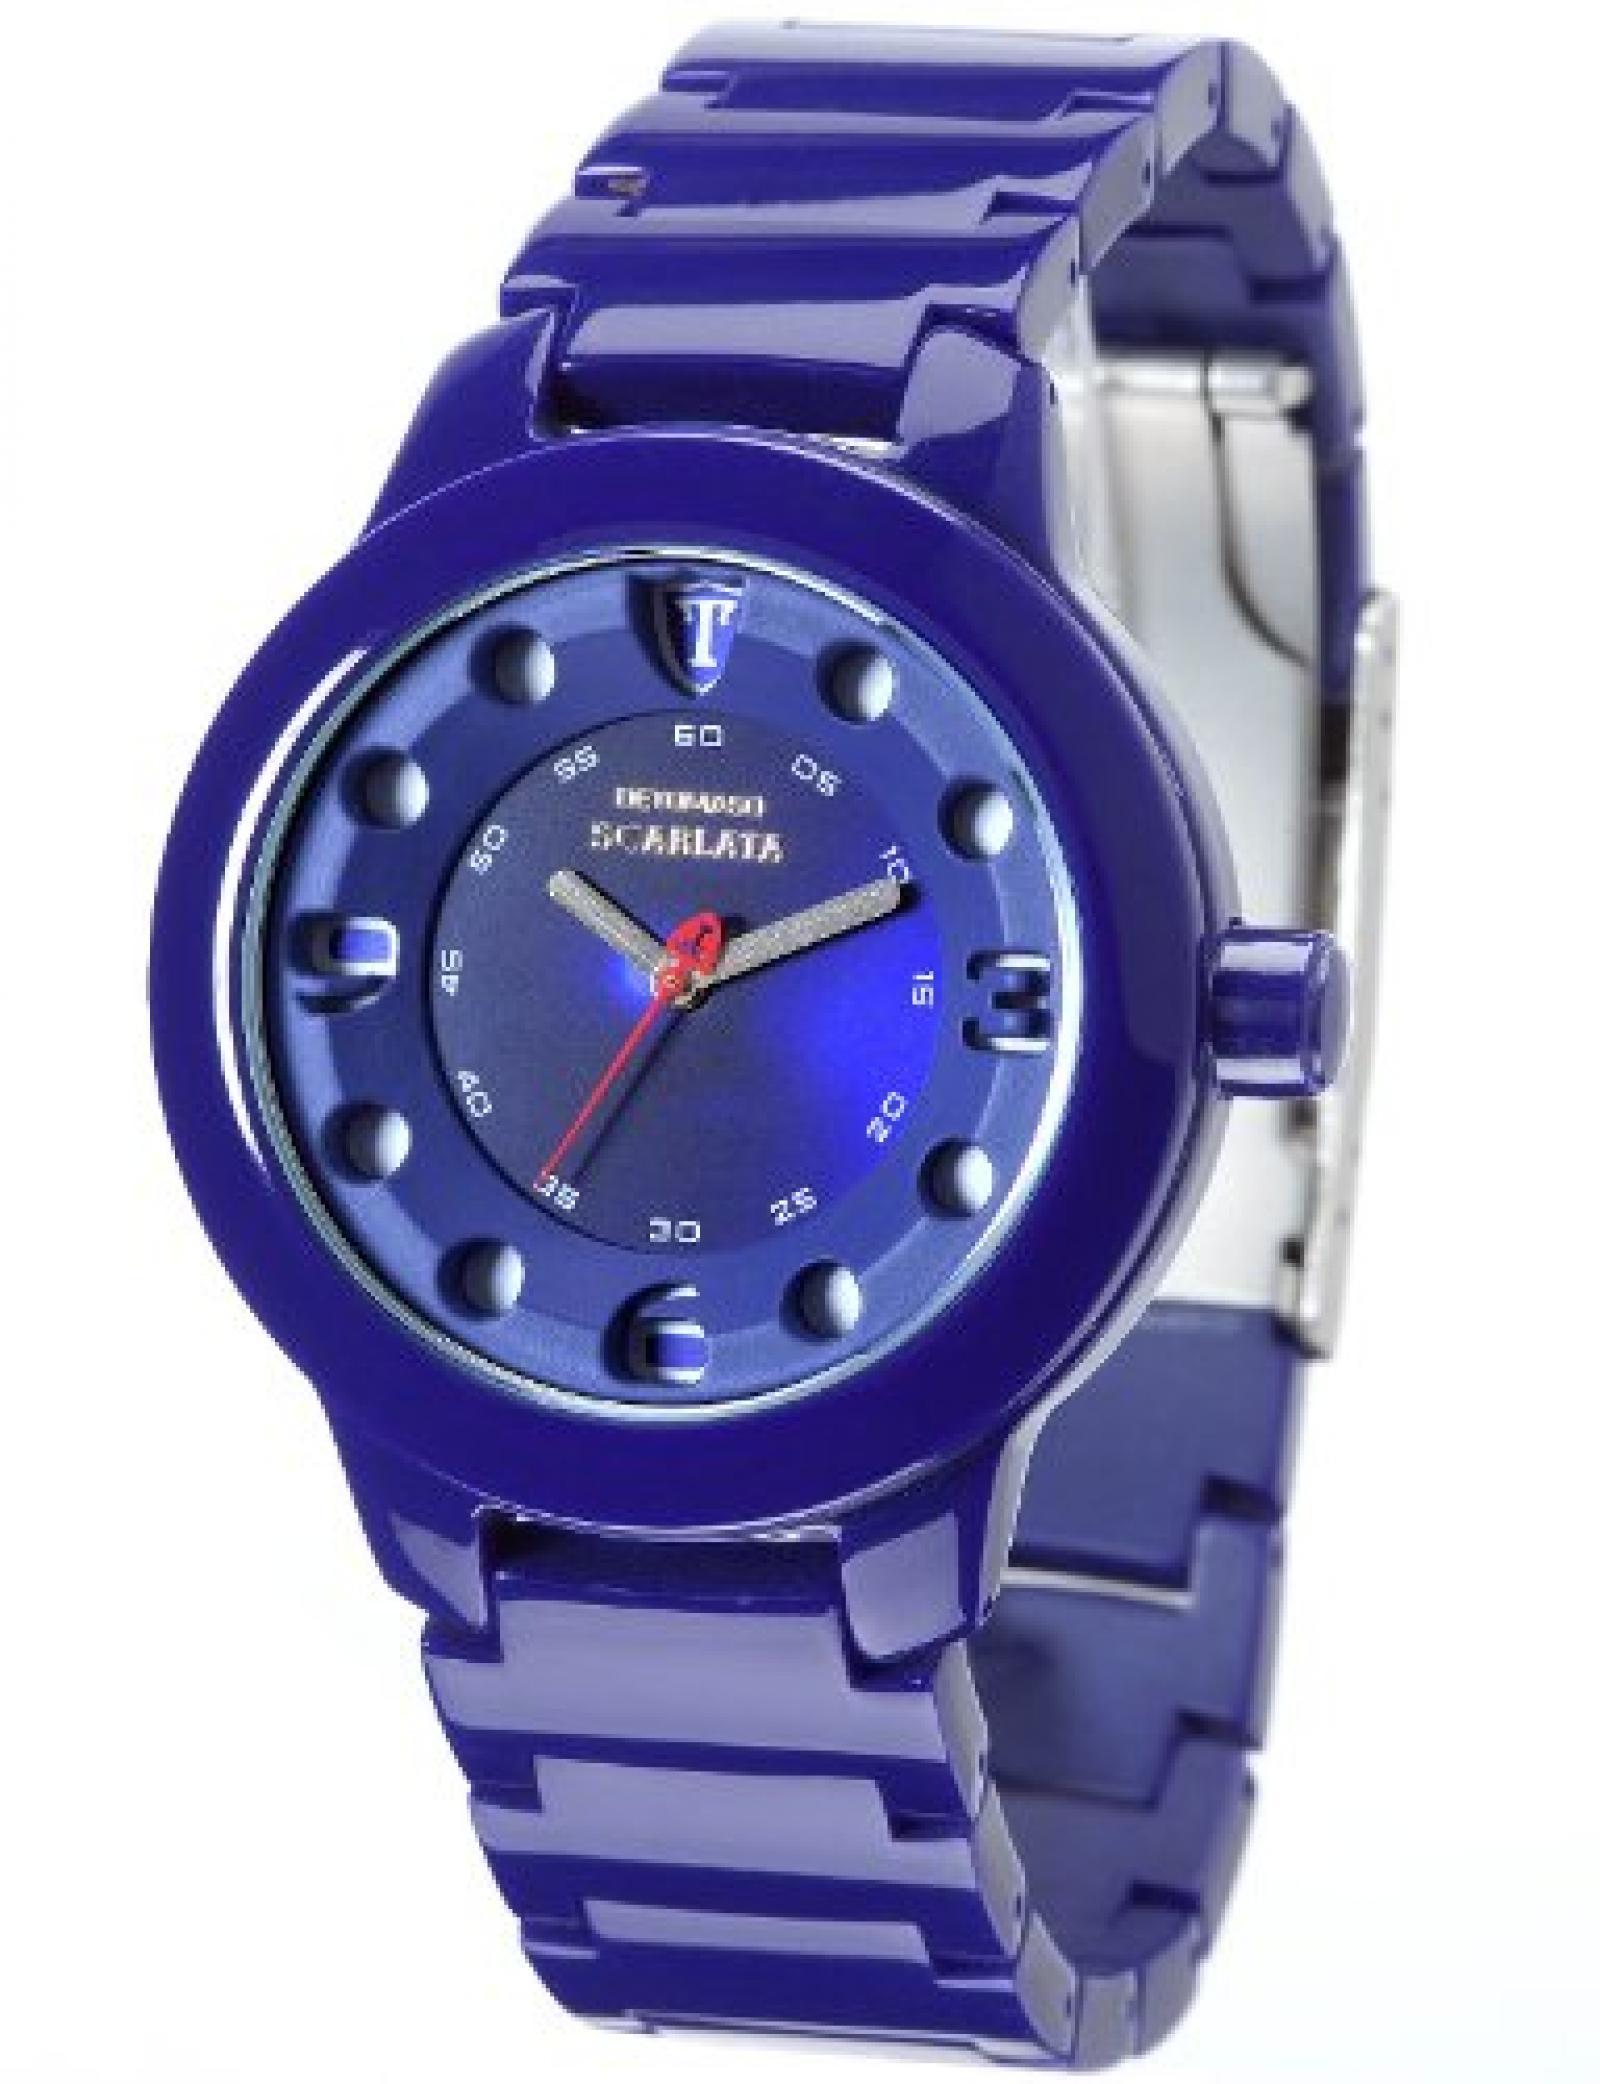 Detomaso Damen-Armbanduhr SCARLATA Violet Ladies Analog Quarz Plastik DT3018-F